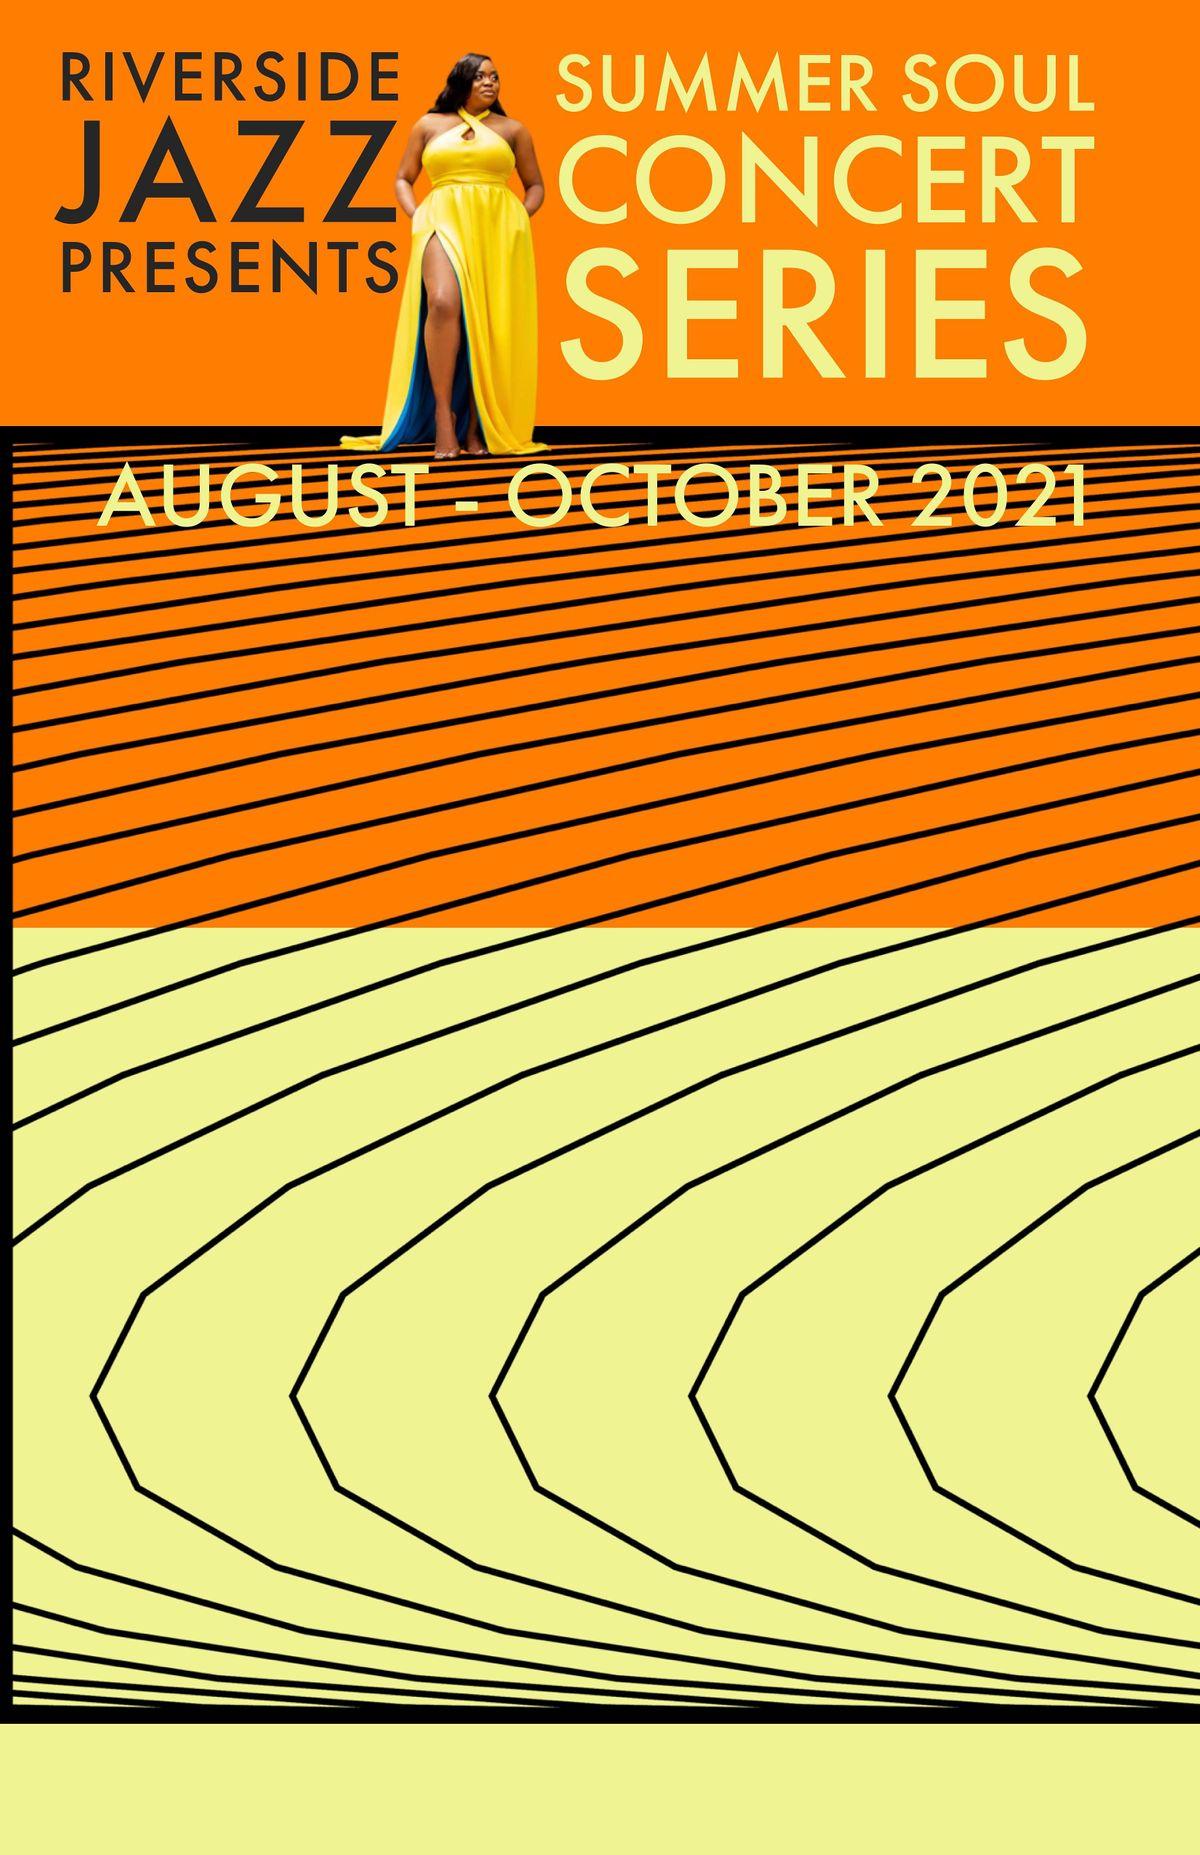 Riverside Jazz - Summer Soul Concert Series | Event in Columbia | AllEvents.in